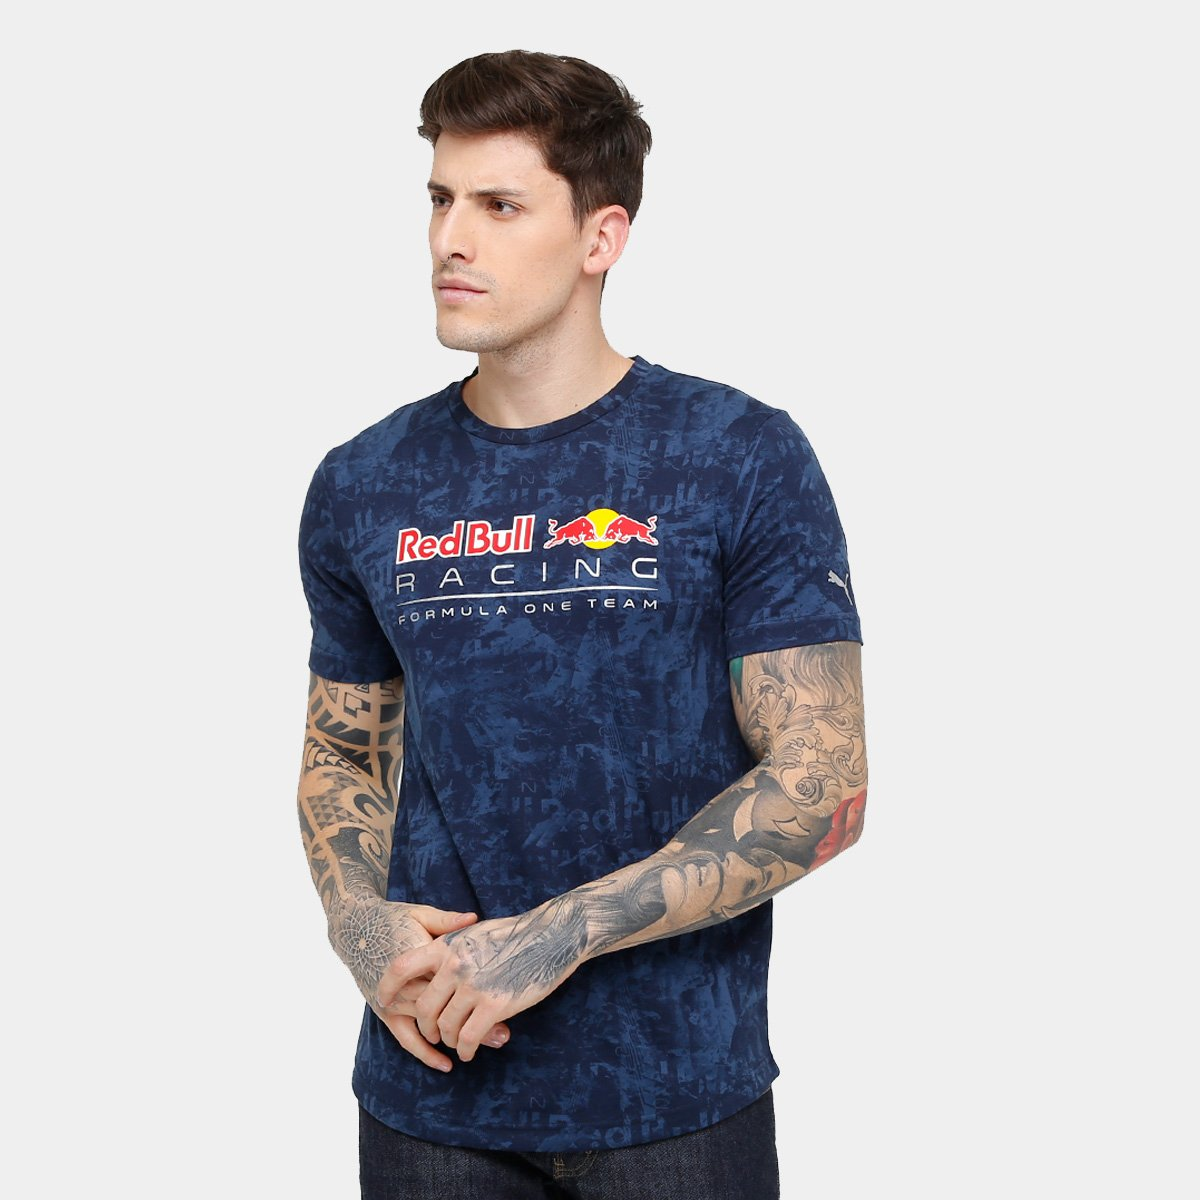 ... Camiseta Puma Red Bull Racing Allover Masculina - Compre Agora ...  d82bf5b0189f6f ... 1c5bbdb7b5c